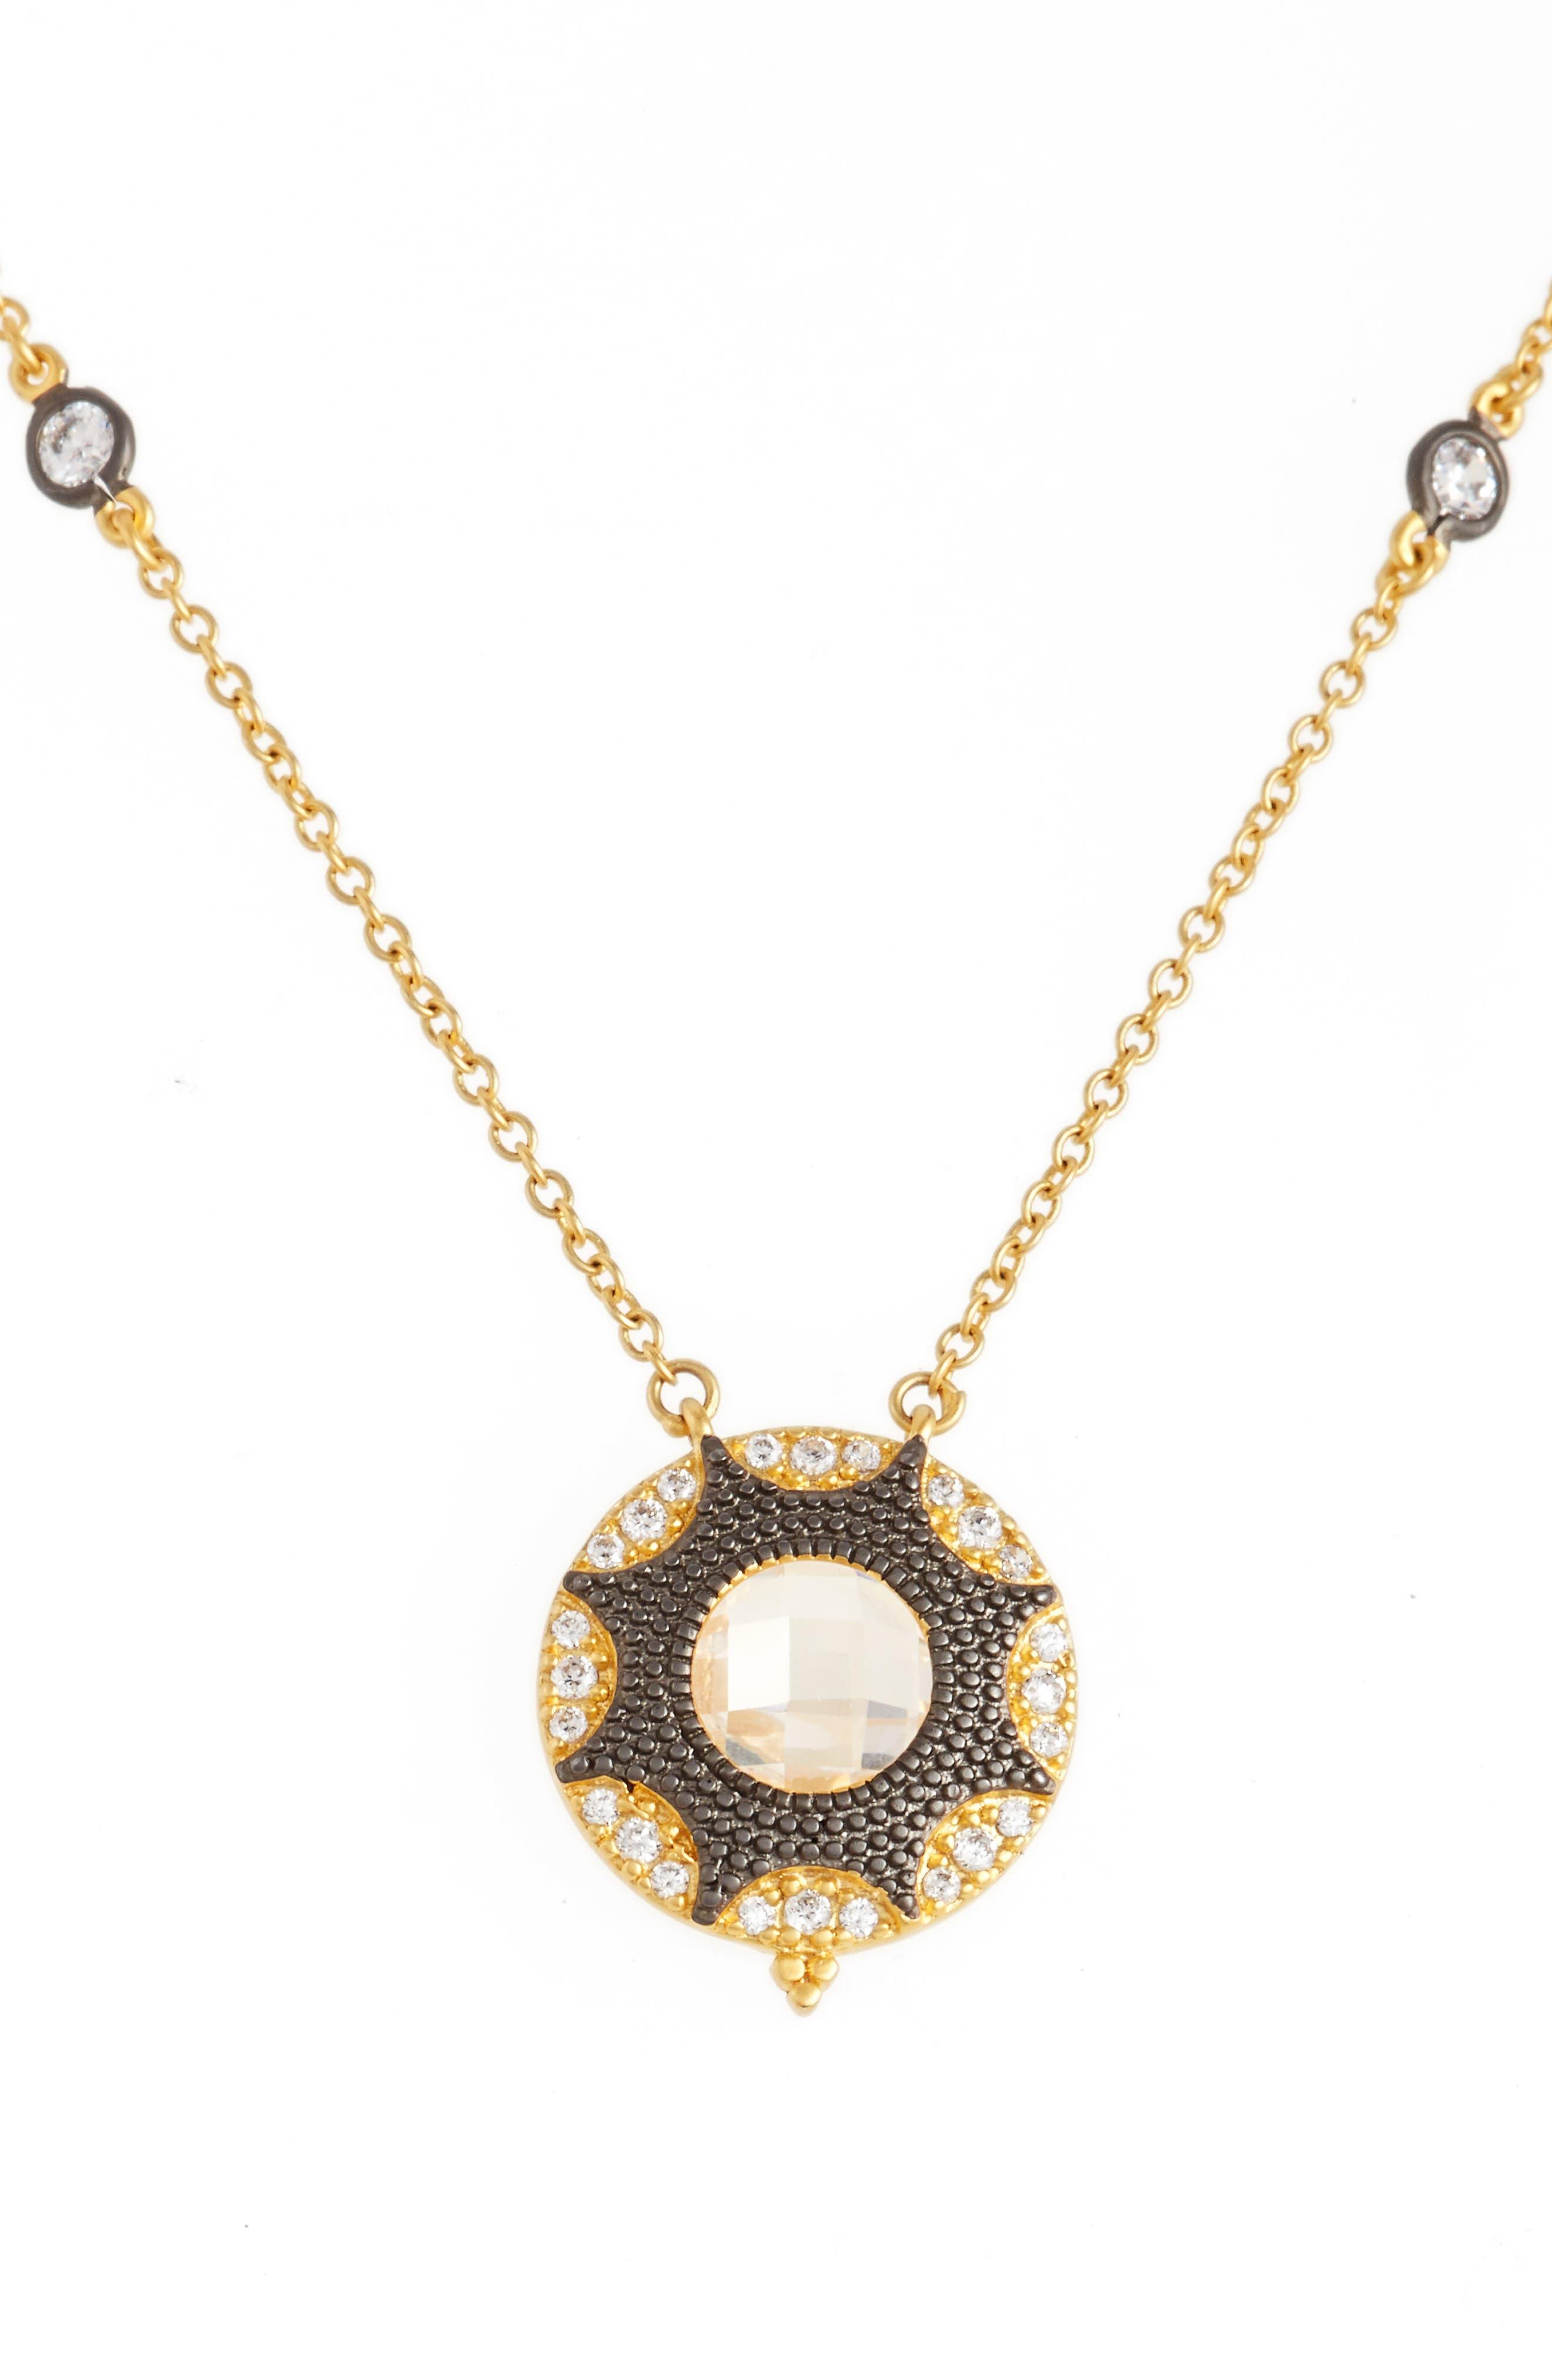 Alternate Image 1 Selected - FREIDA ROTHMAN Round Pendant Necklace